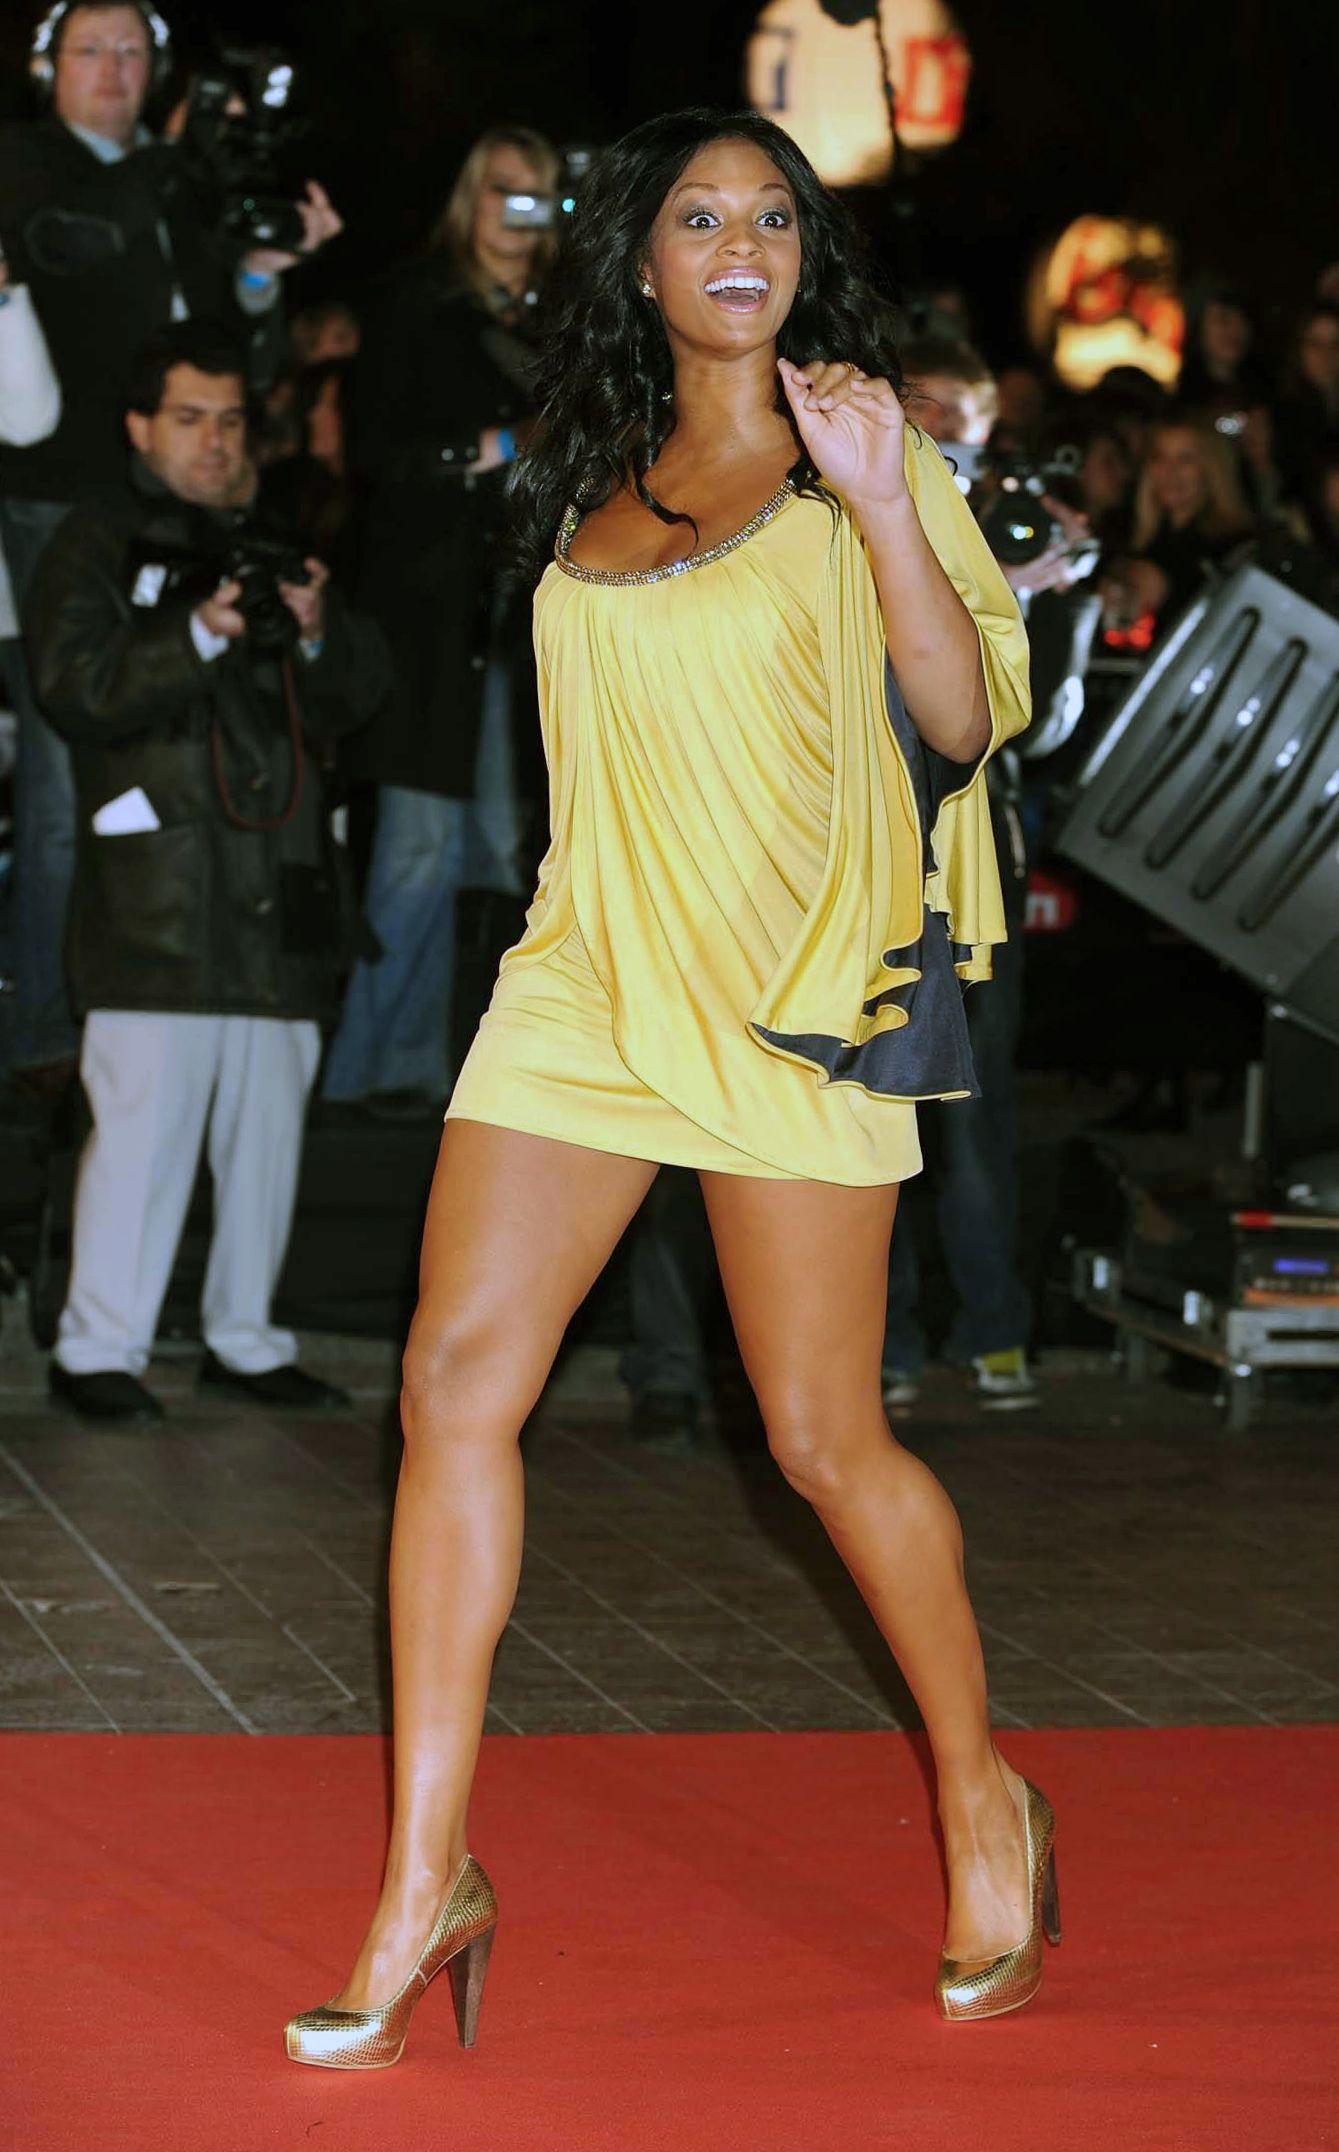 Photo Of Alesha Dixon Sexy Legs  Alesha Dixon  Alesha -4823